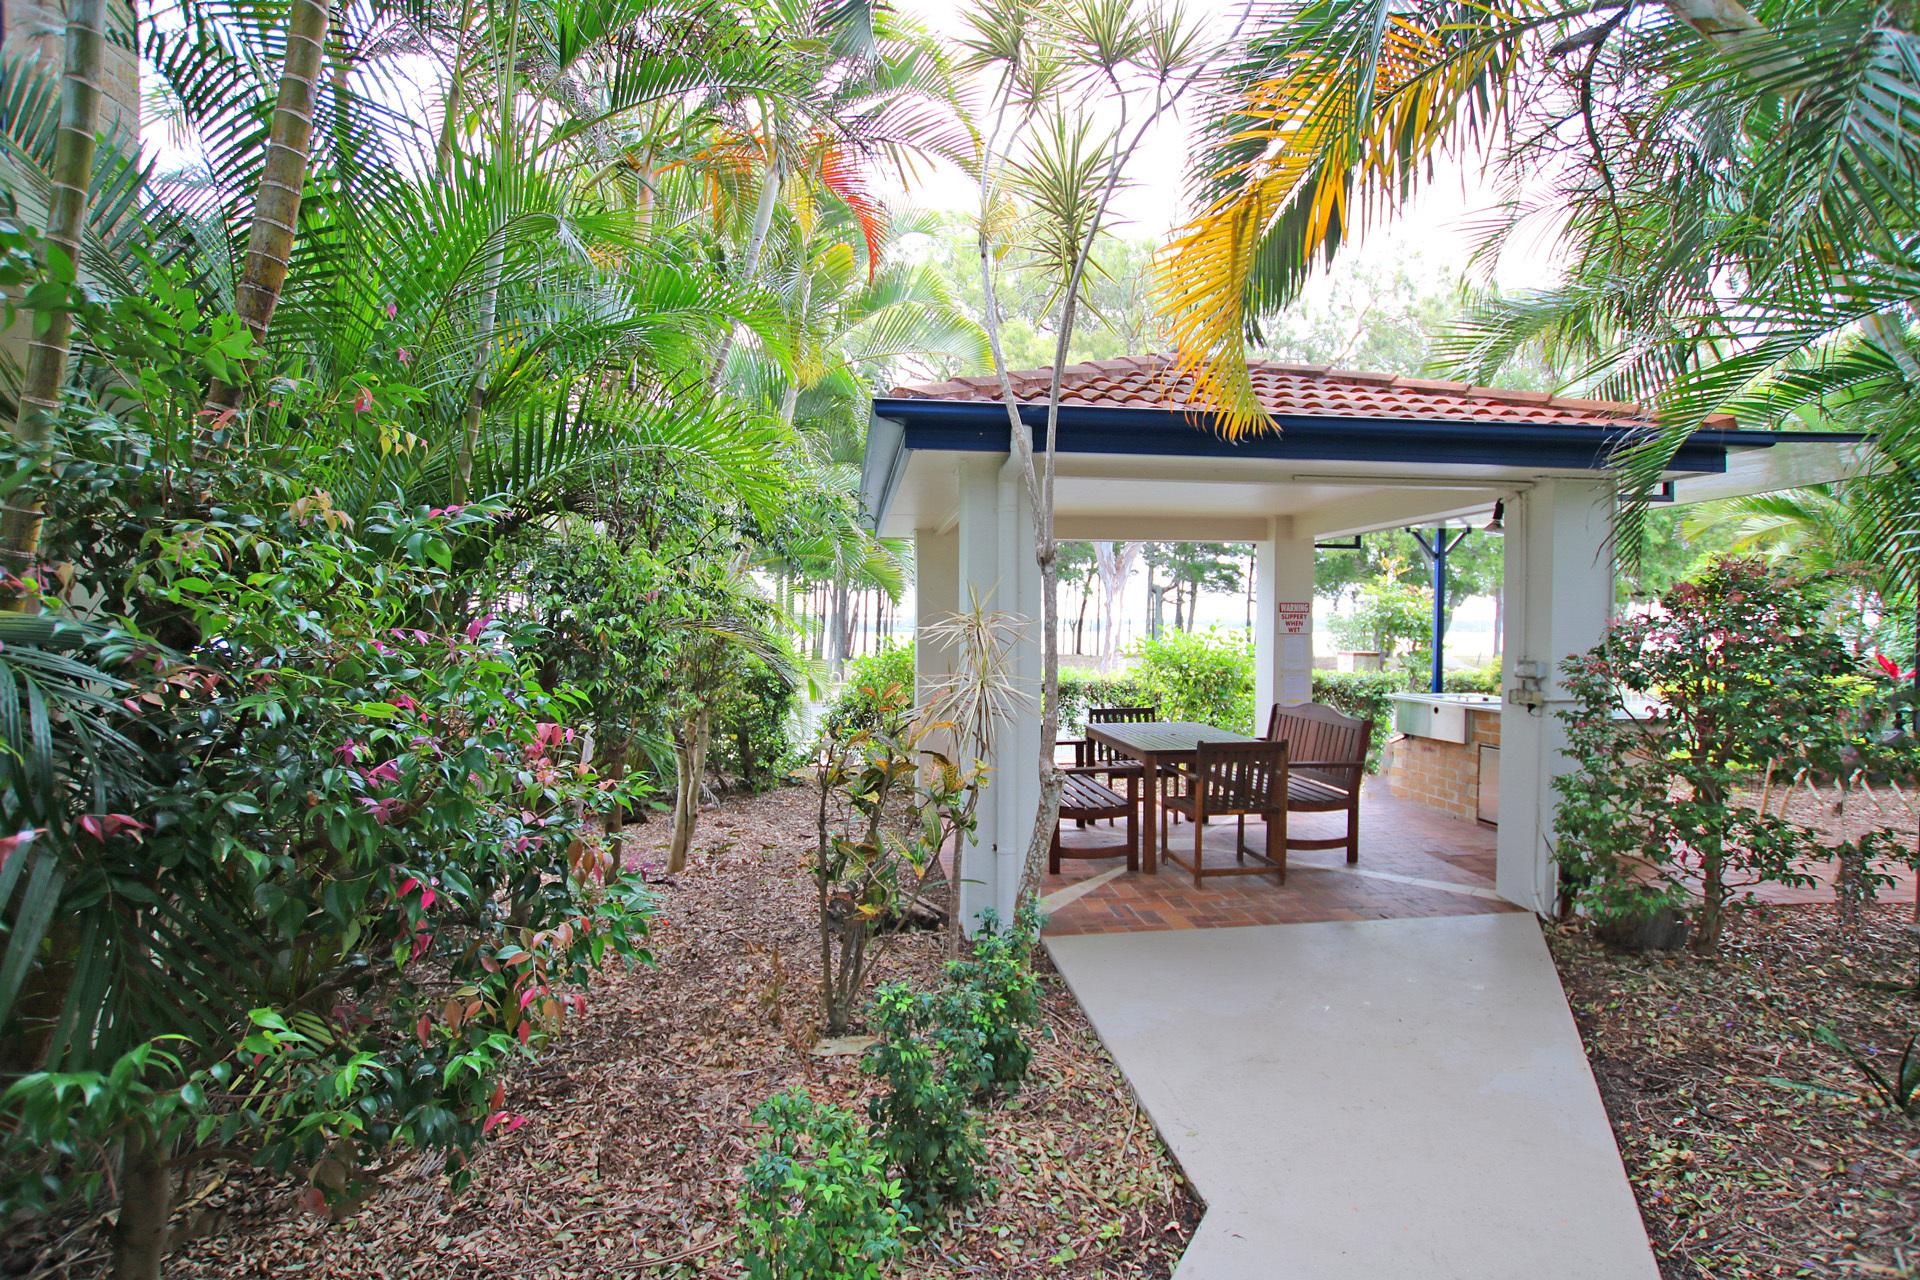 c - Sylvan Beach Resort